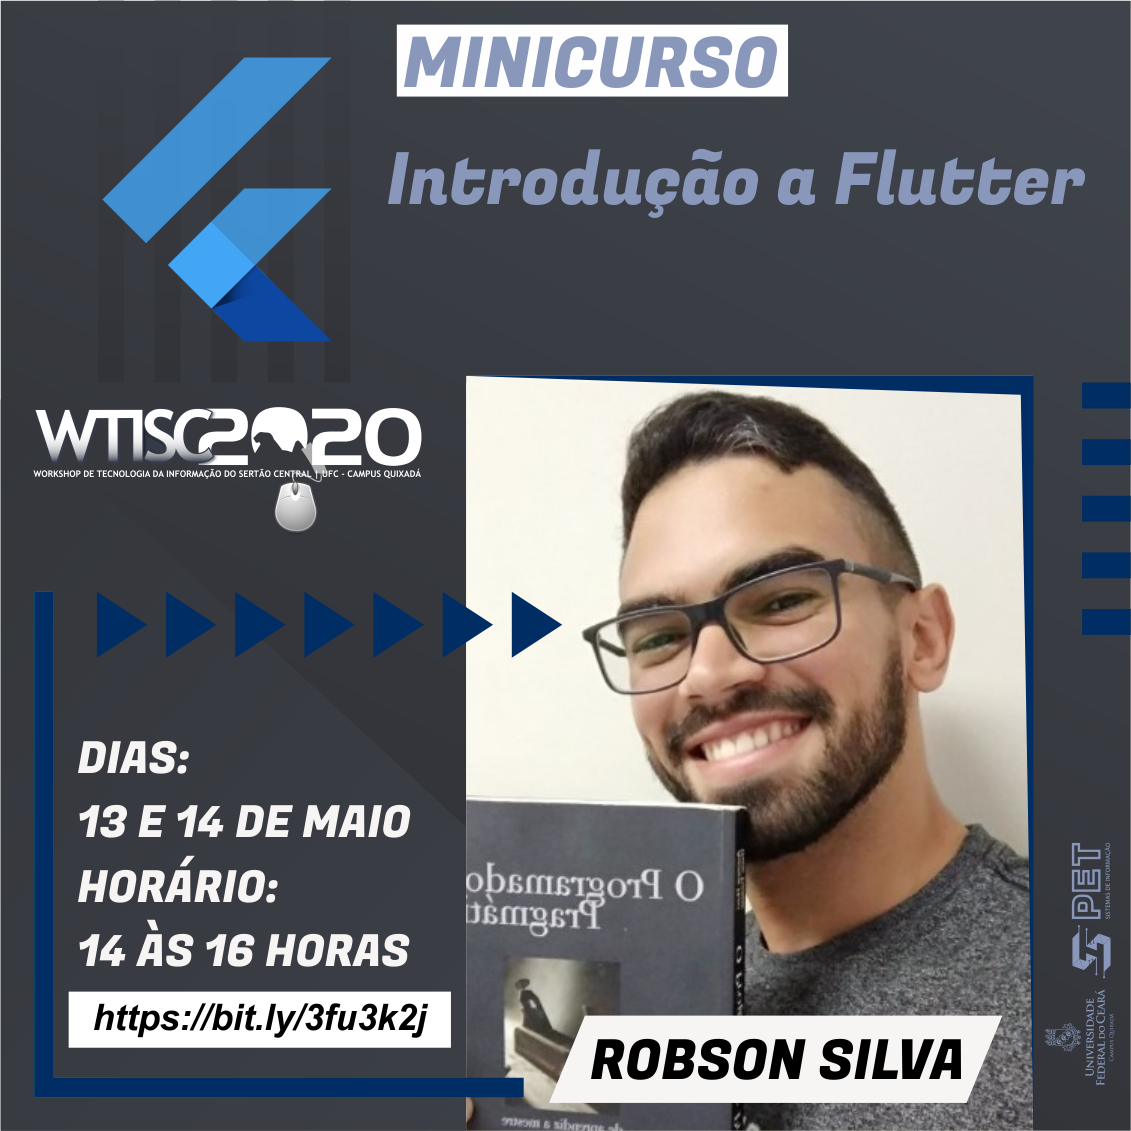 MINICURSO-ROBSON-2